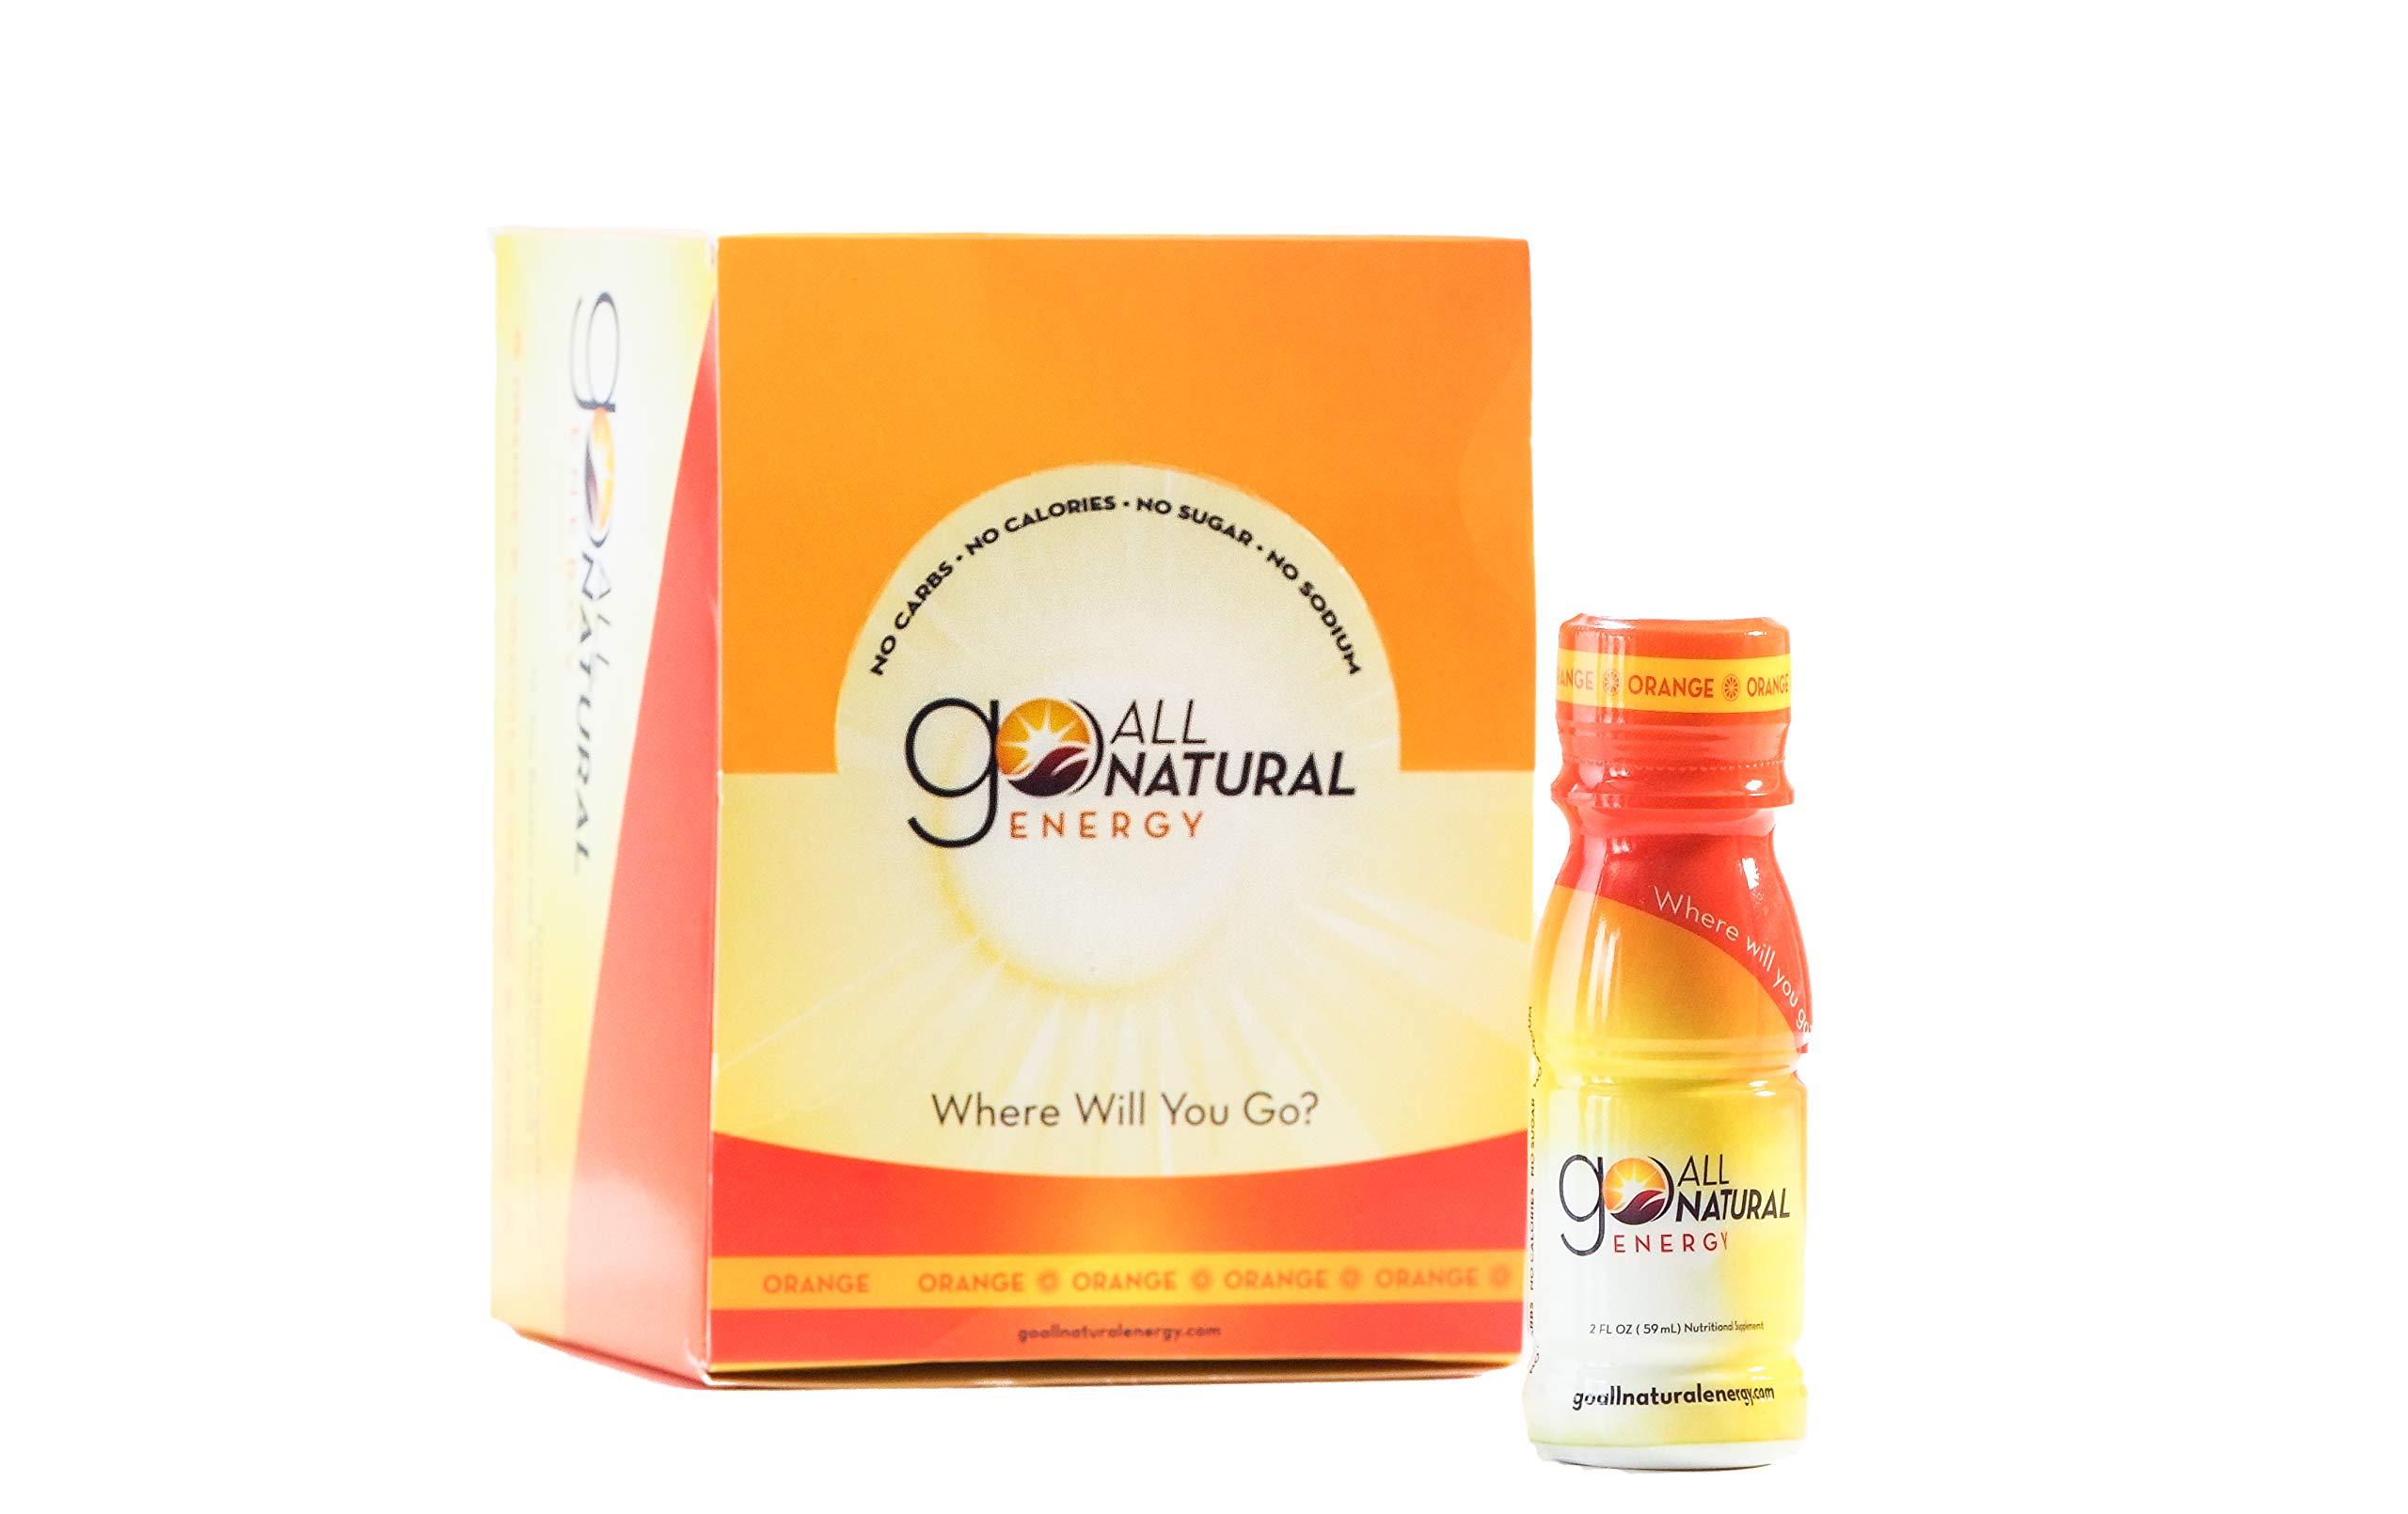 Go All Natural Energy 2 Ounce Shot 12 Pack (Orange) by Go All Natural Energy